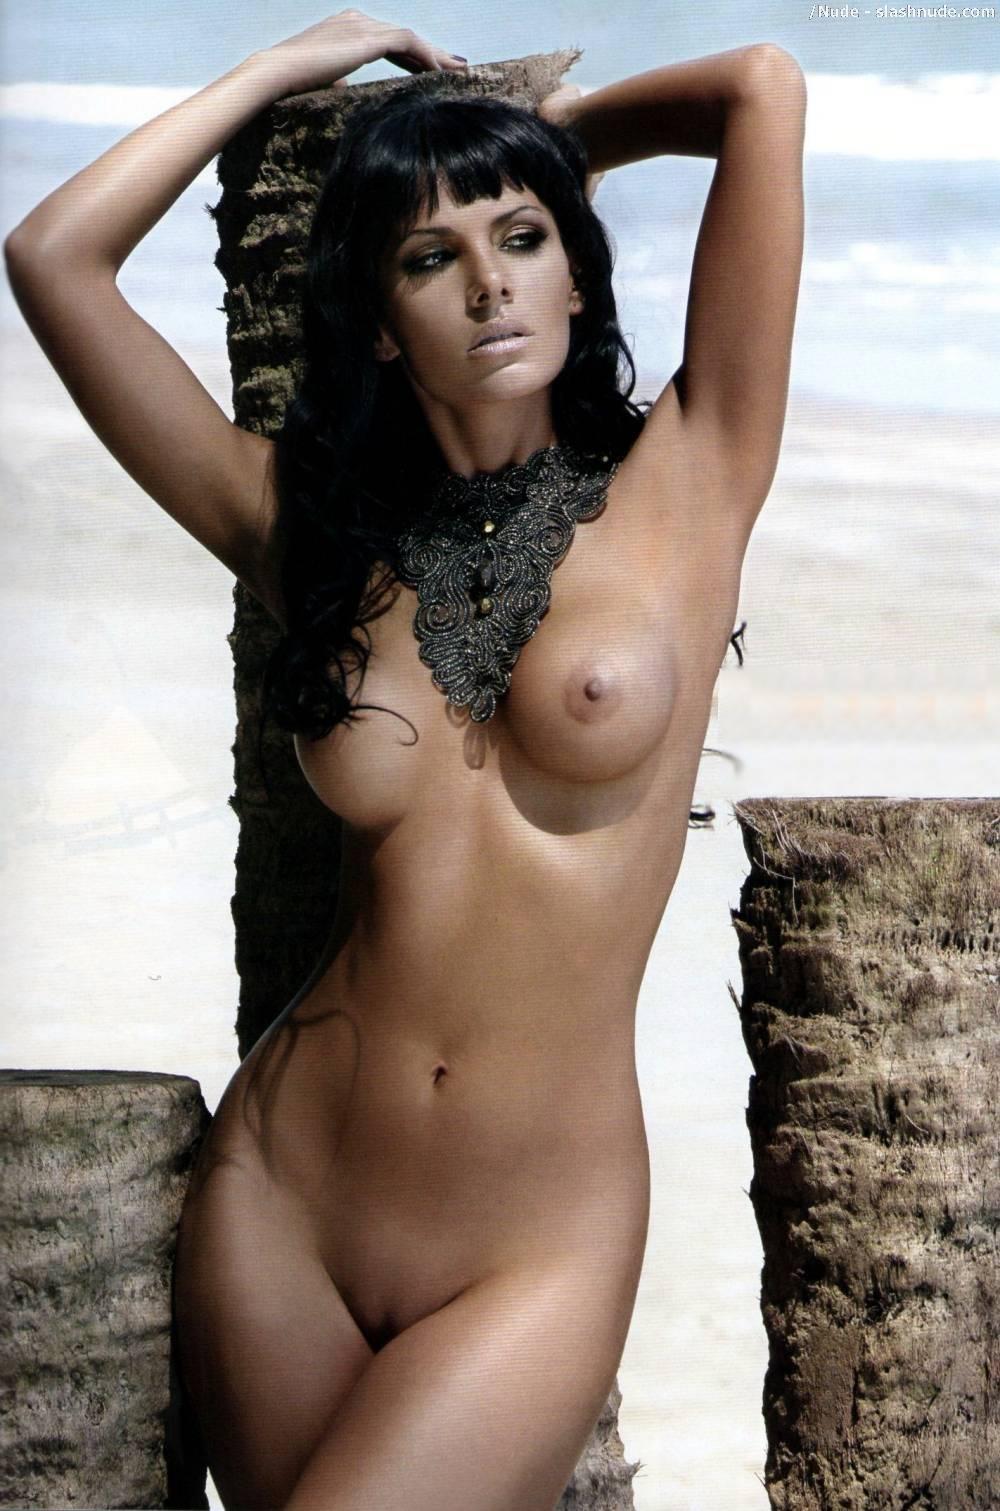 vanessa arias nude